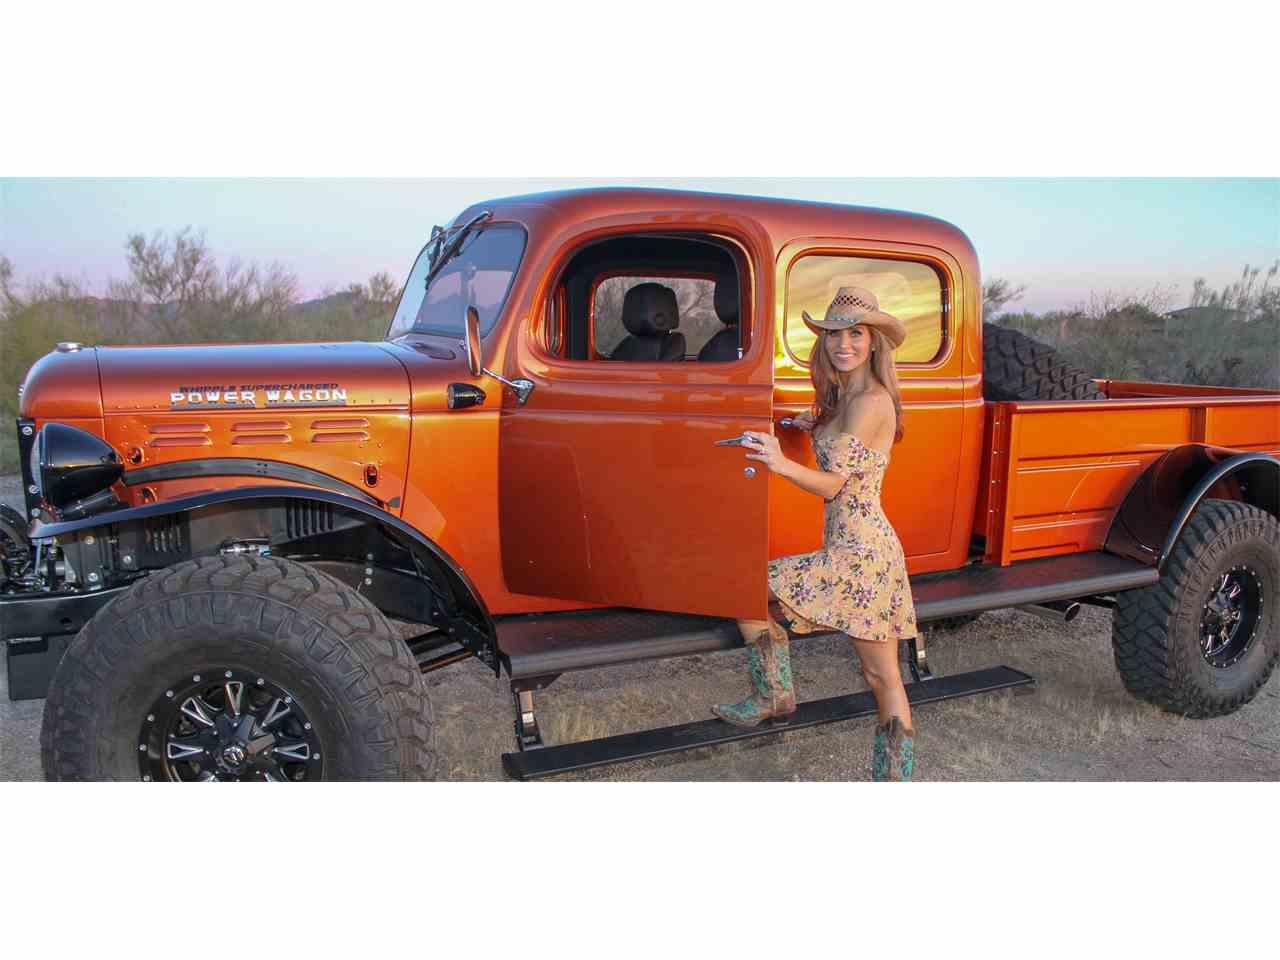 Craigslist Cars For Sale Dodge Ram